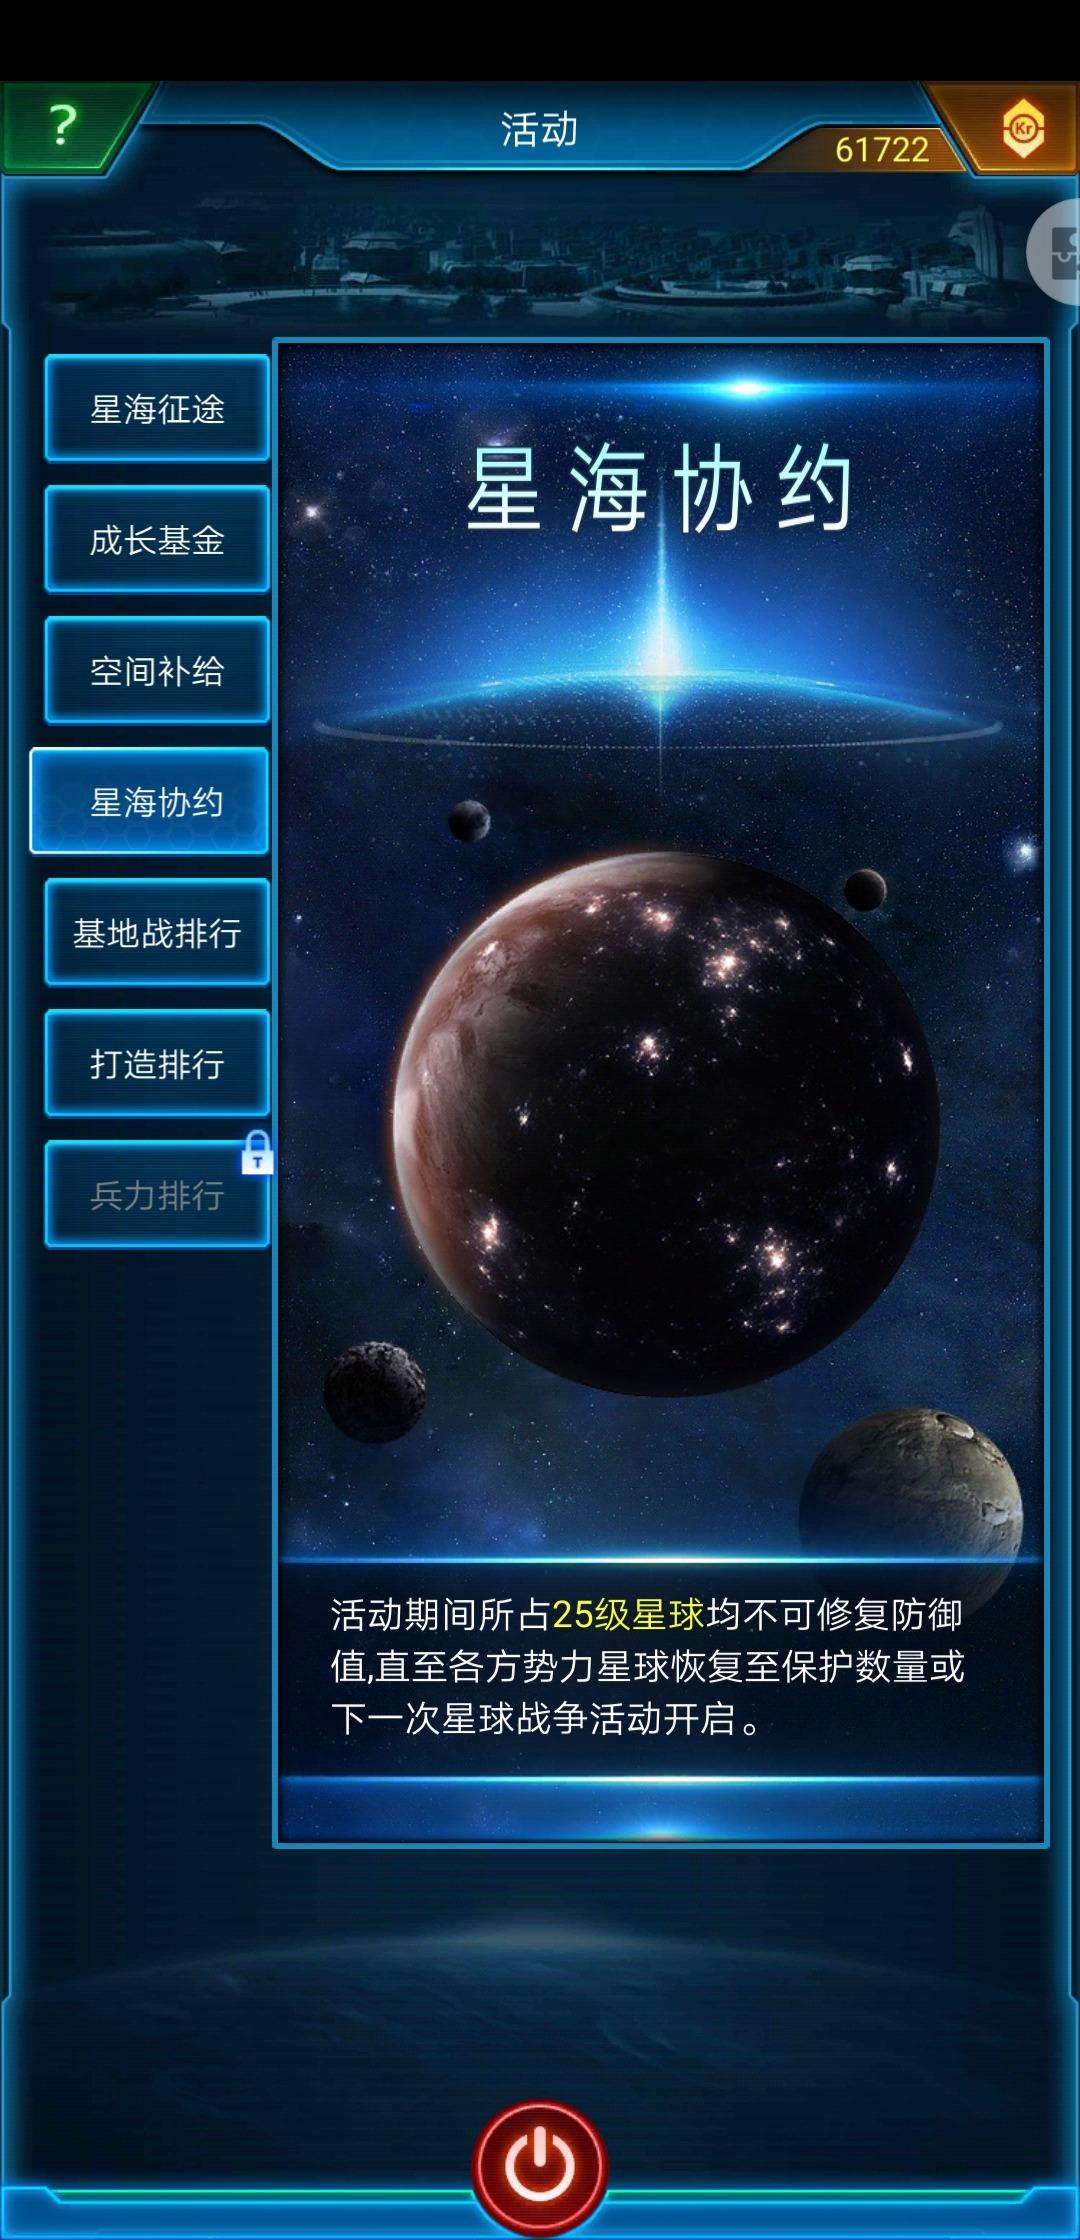 Screenshot_20190706_081151_com.jedigames.p16s.huawei.jpg